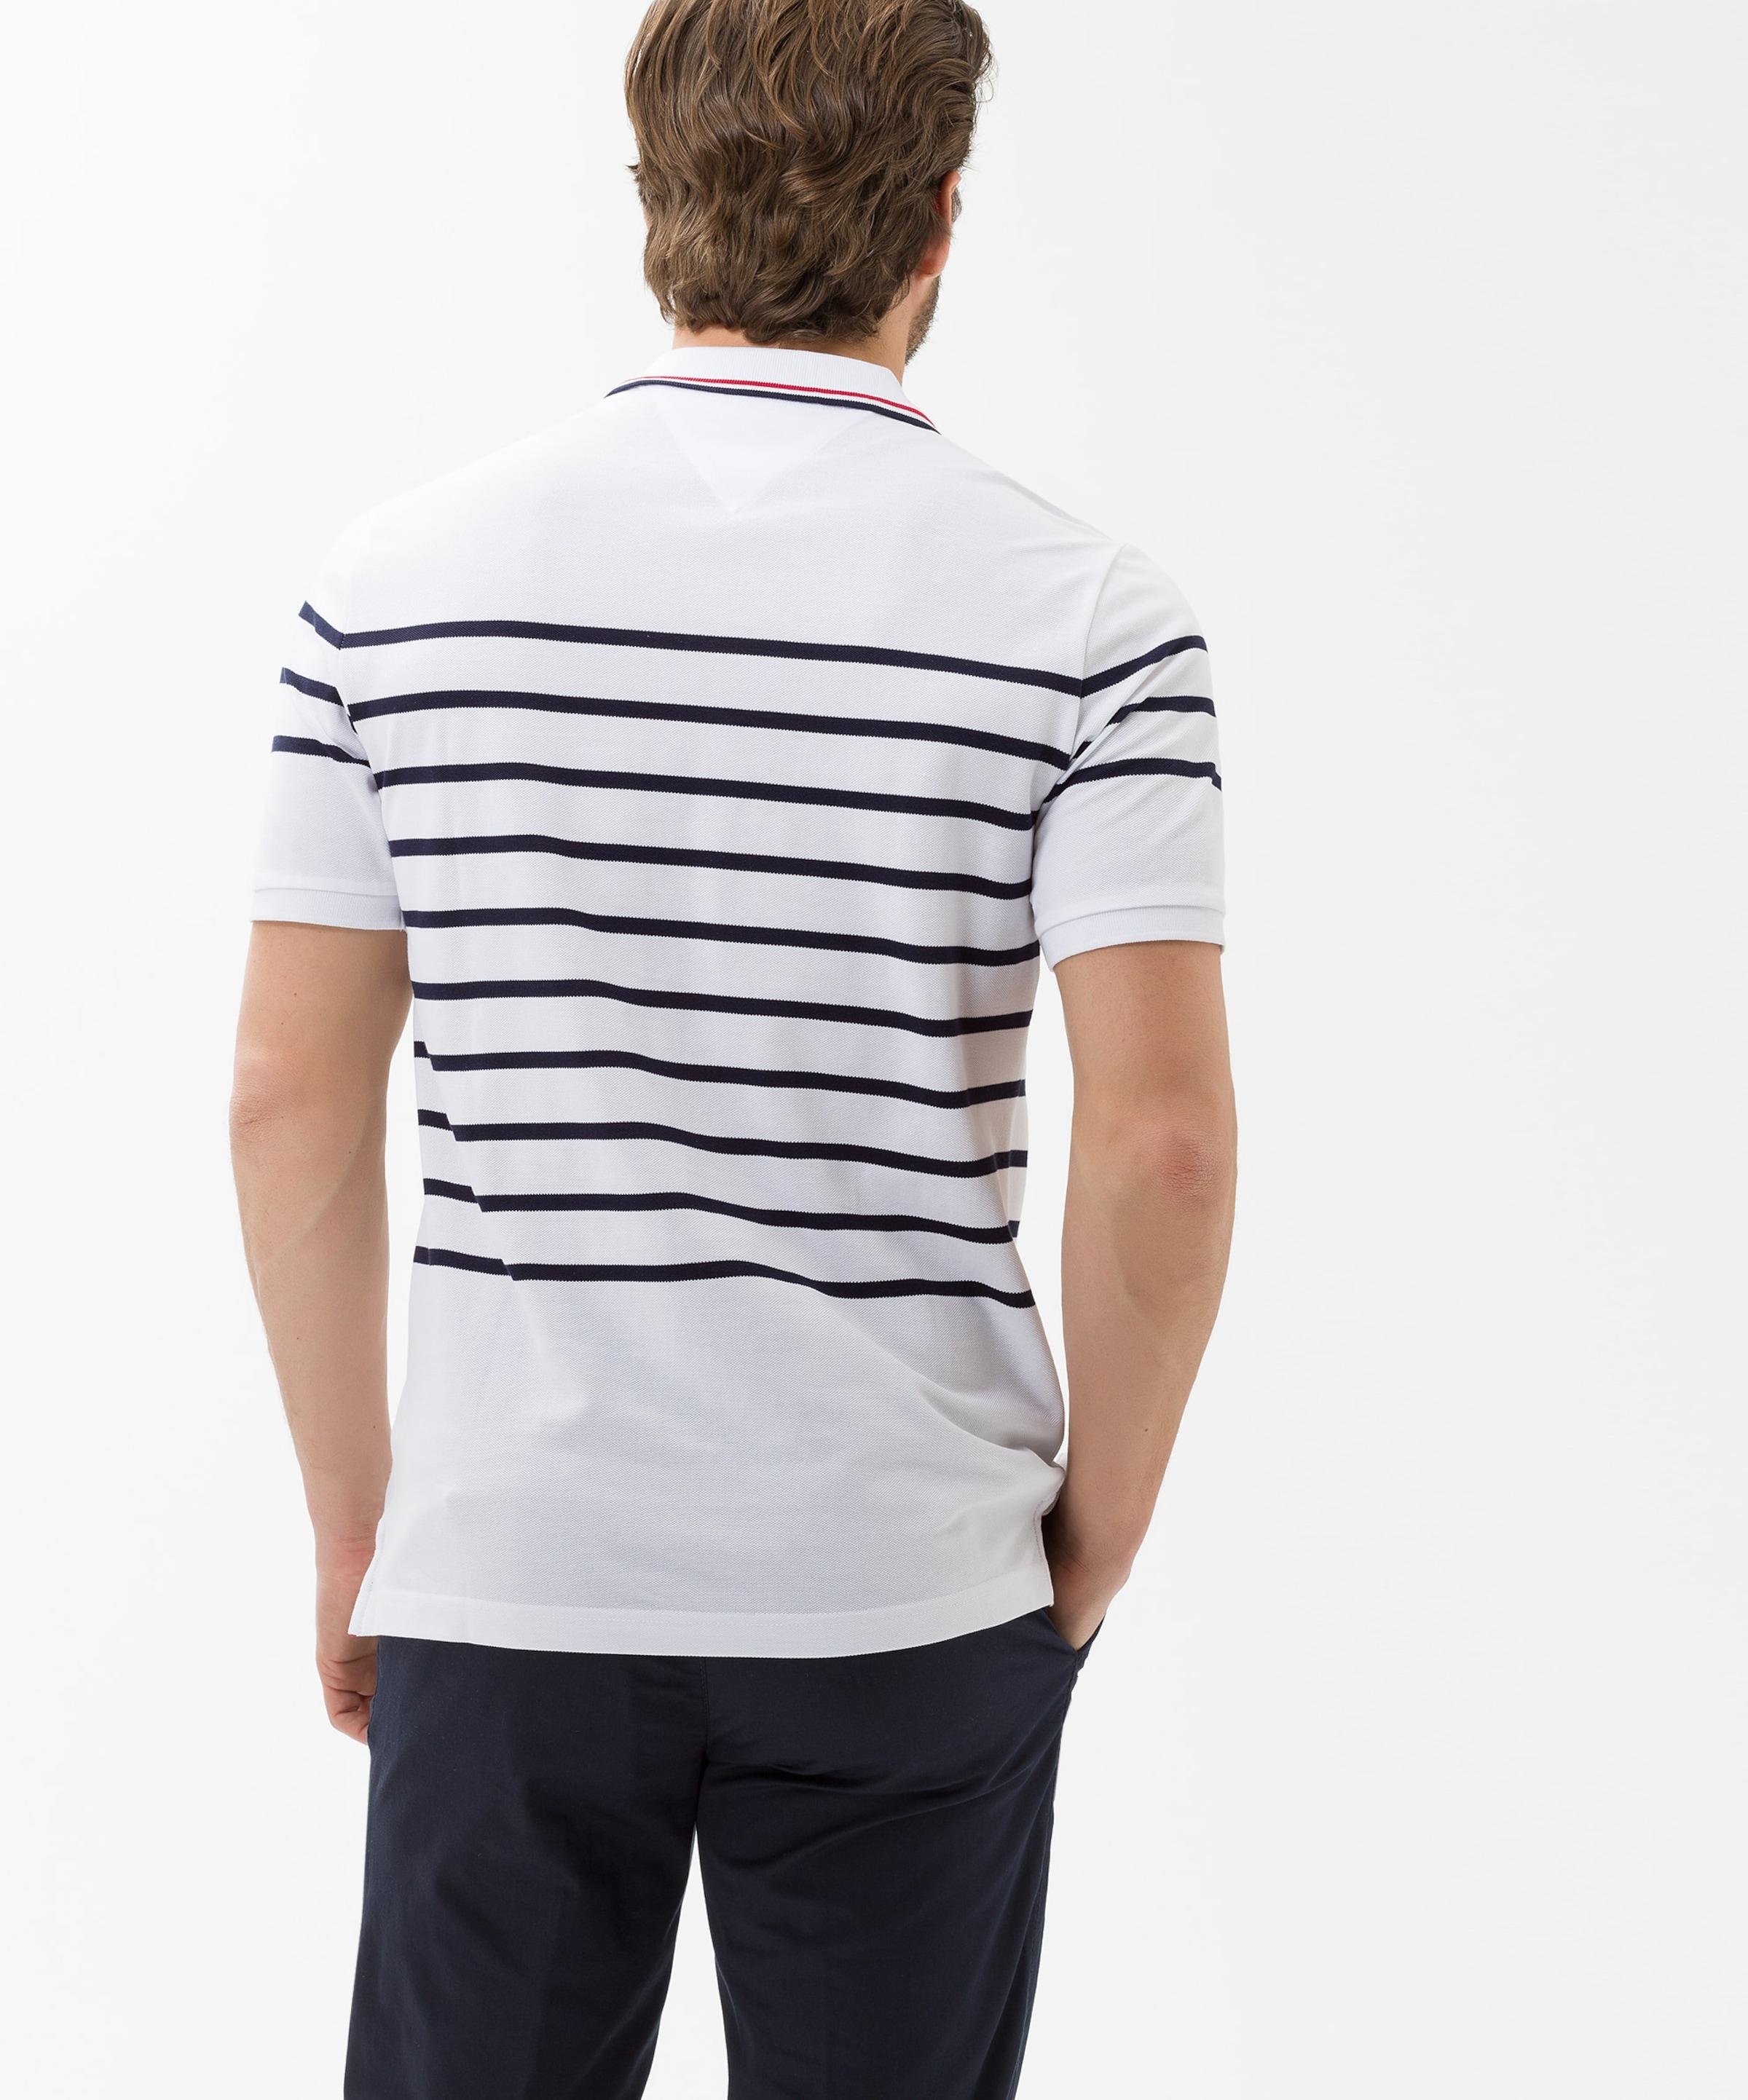 Poloshirt DunkelblauRot Weiß Brax 'paco' In 5L3jc4ARq